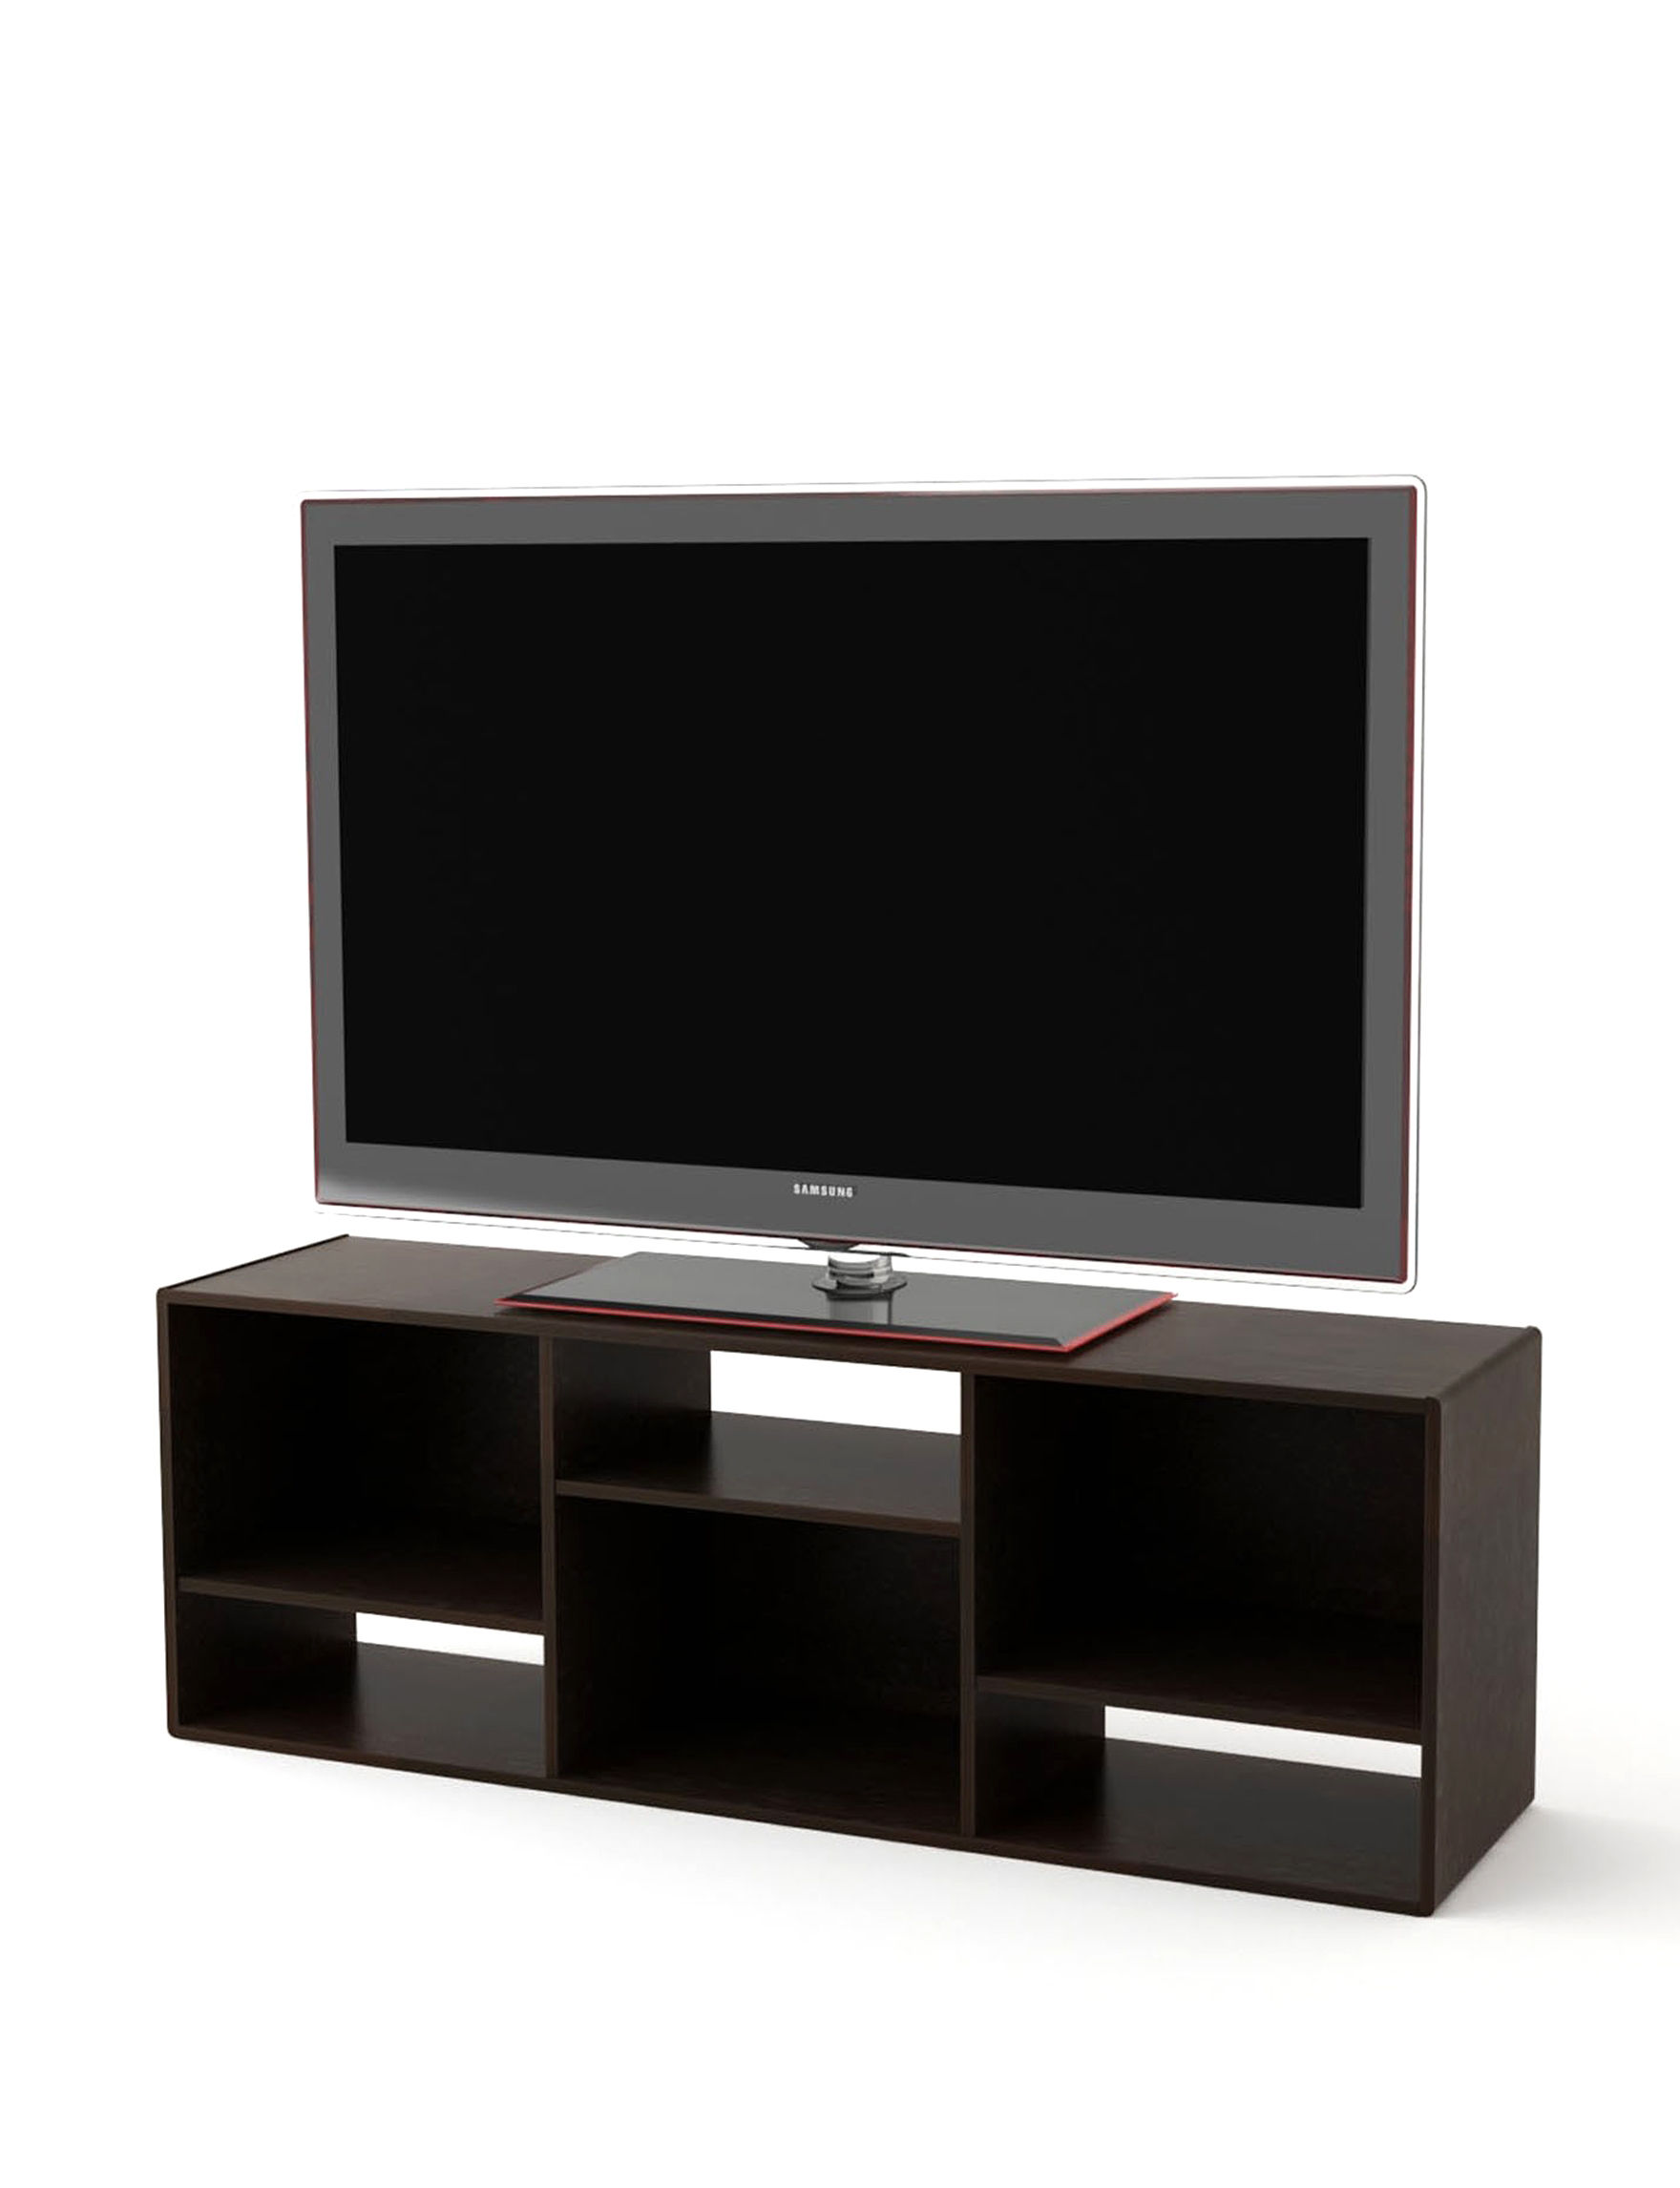 Ameriwood Espresso TV Stands & Entertainment Centers Living Room Furniture